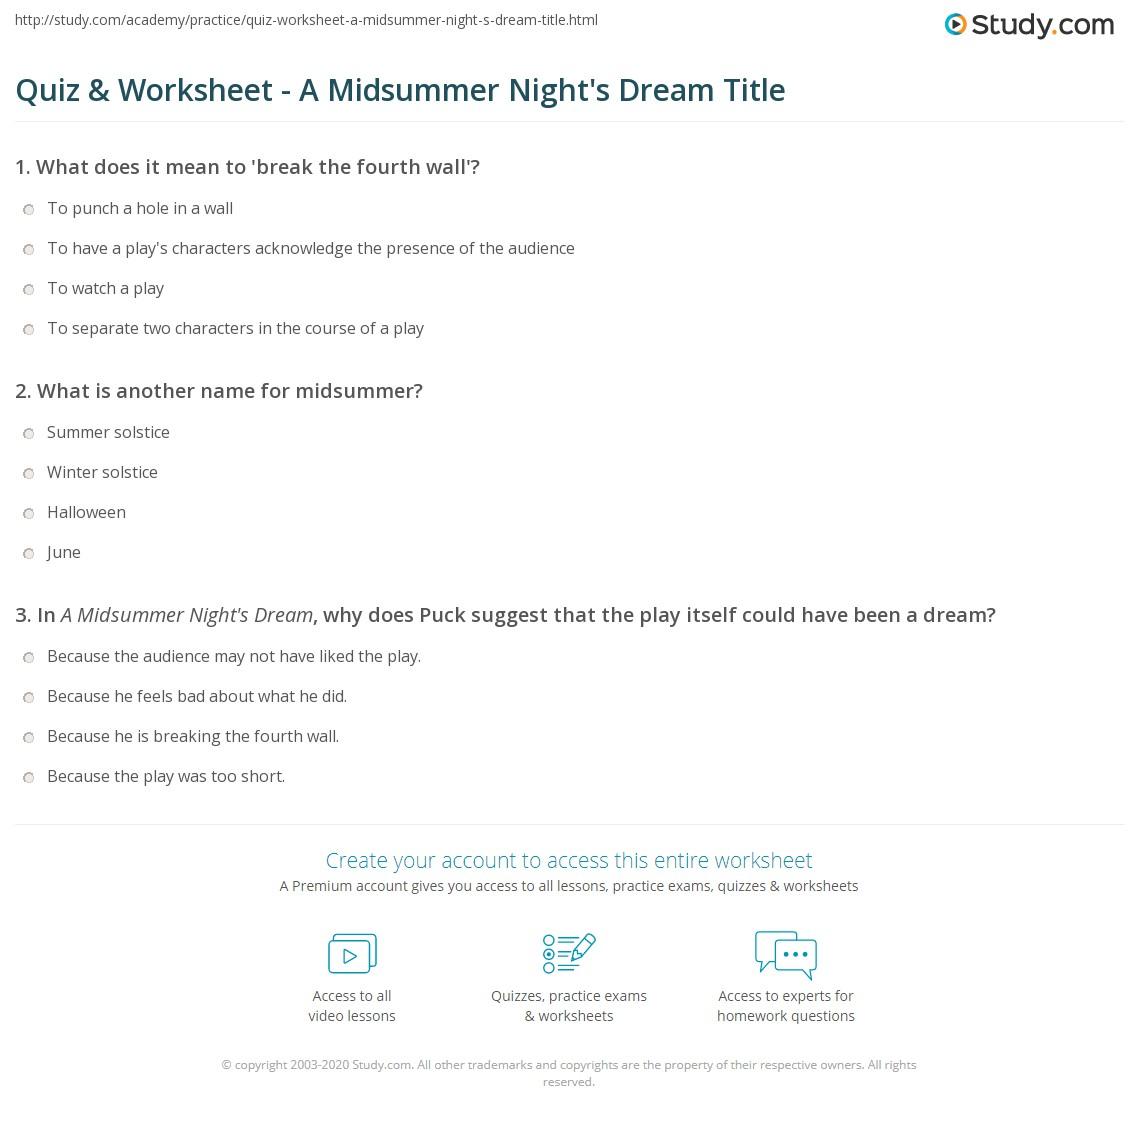 Quiz & Worksheet - A Midsummer Night's Dream Title | Study com